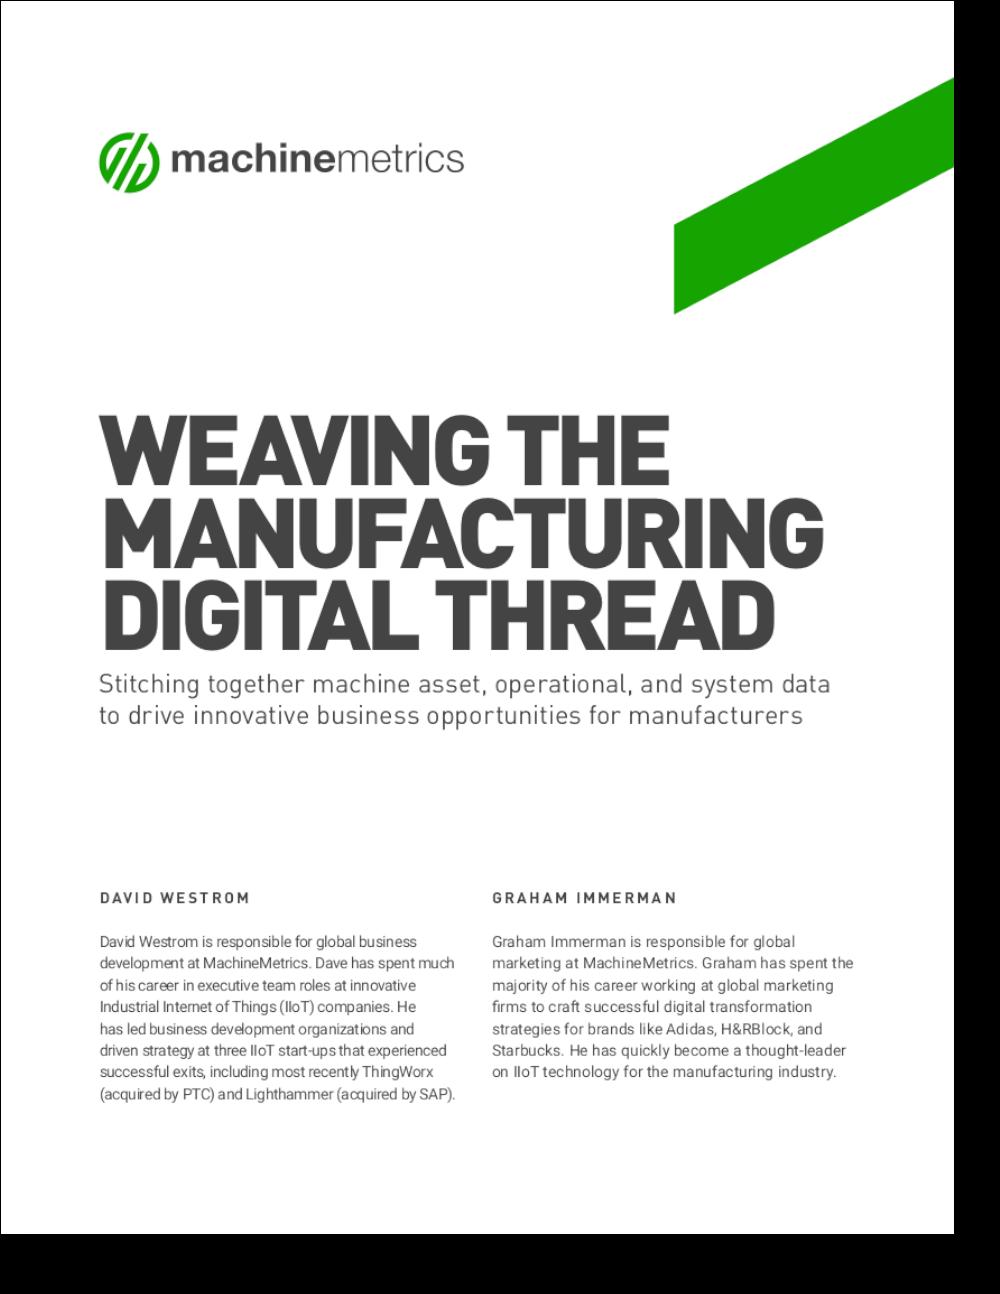 Weaving the Manufacturing Digital Thread